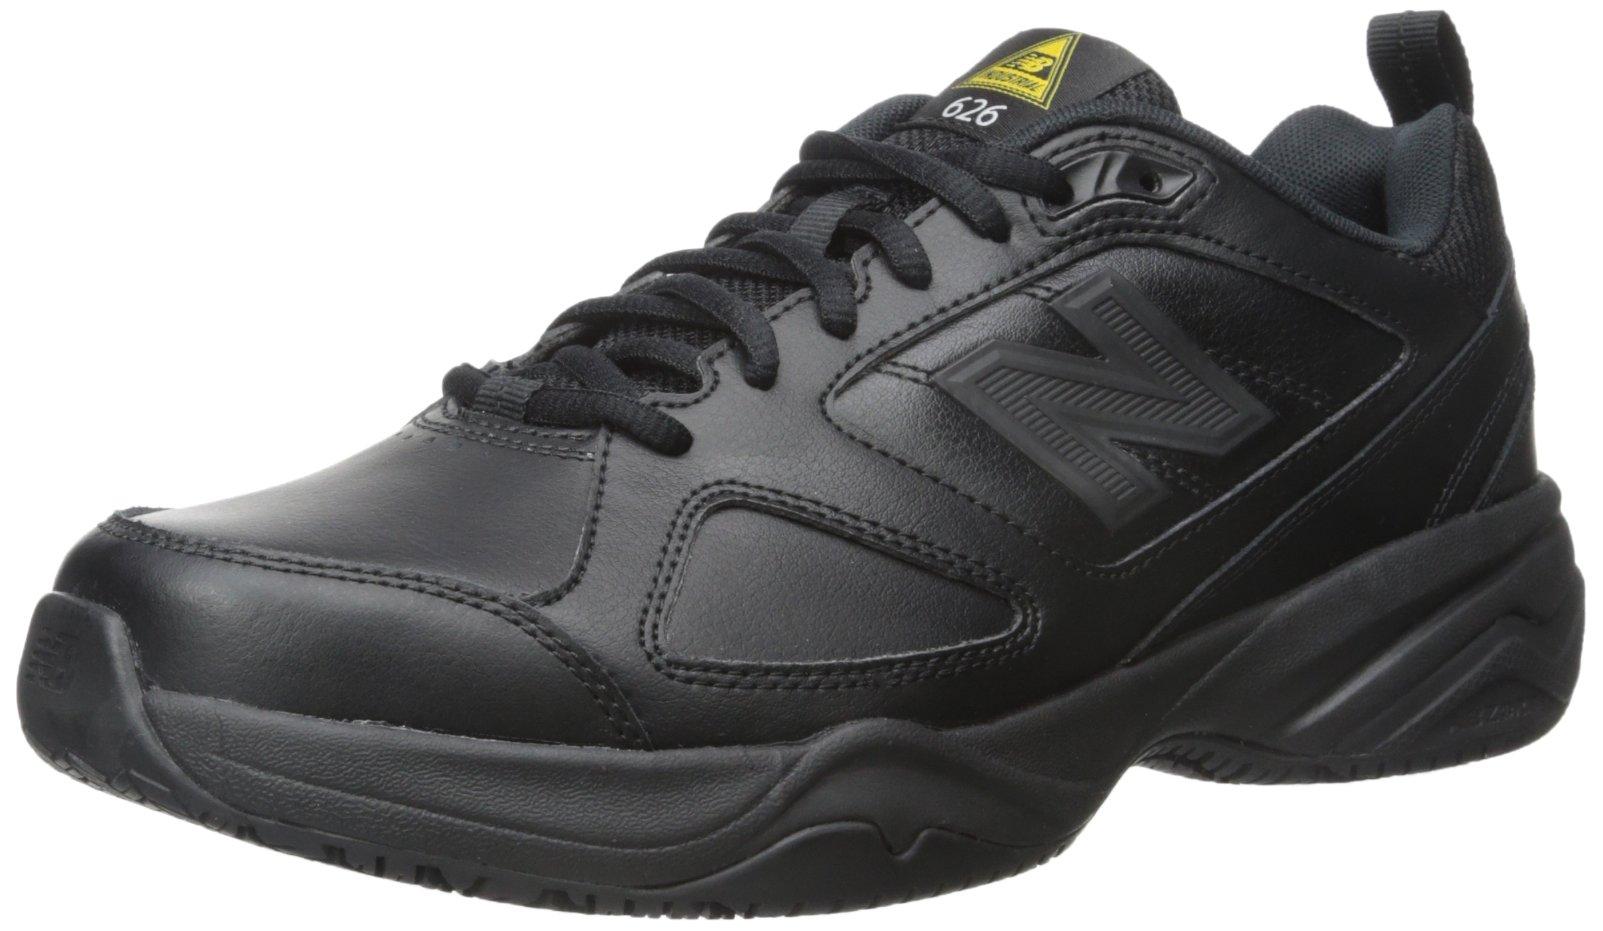 New Balance Men's MID626v2 Work Training Shoe,  Black, 10 M US by New Balance